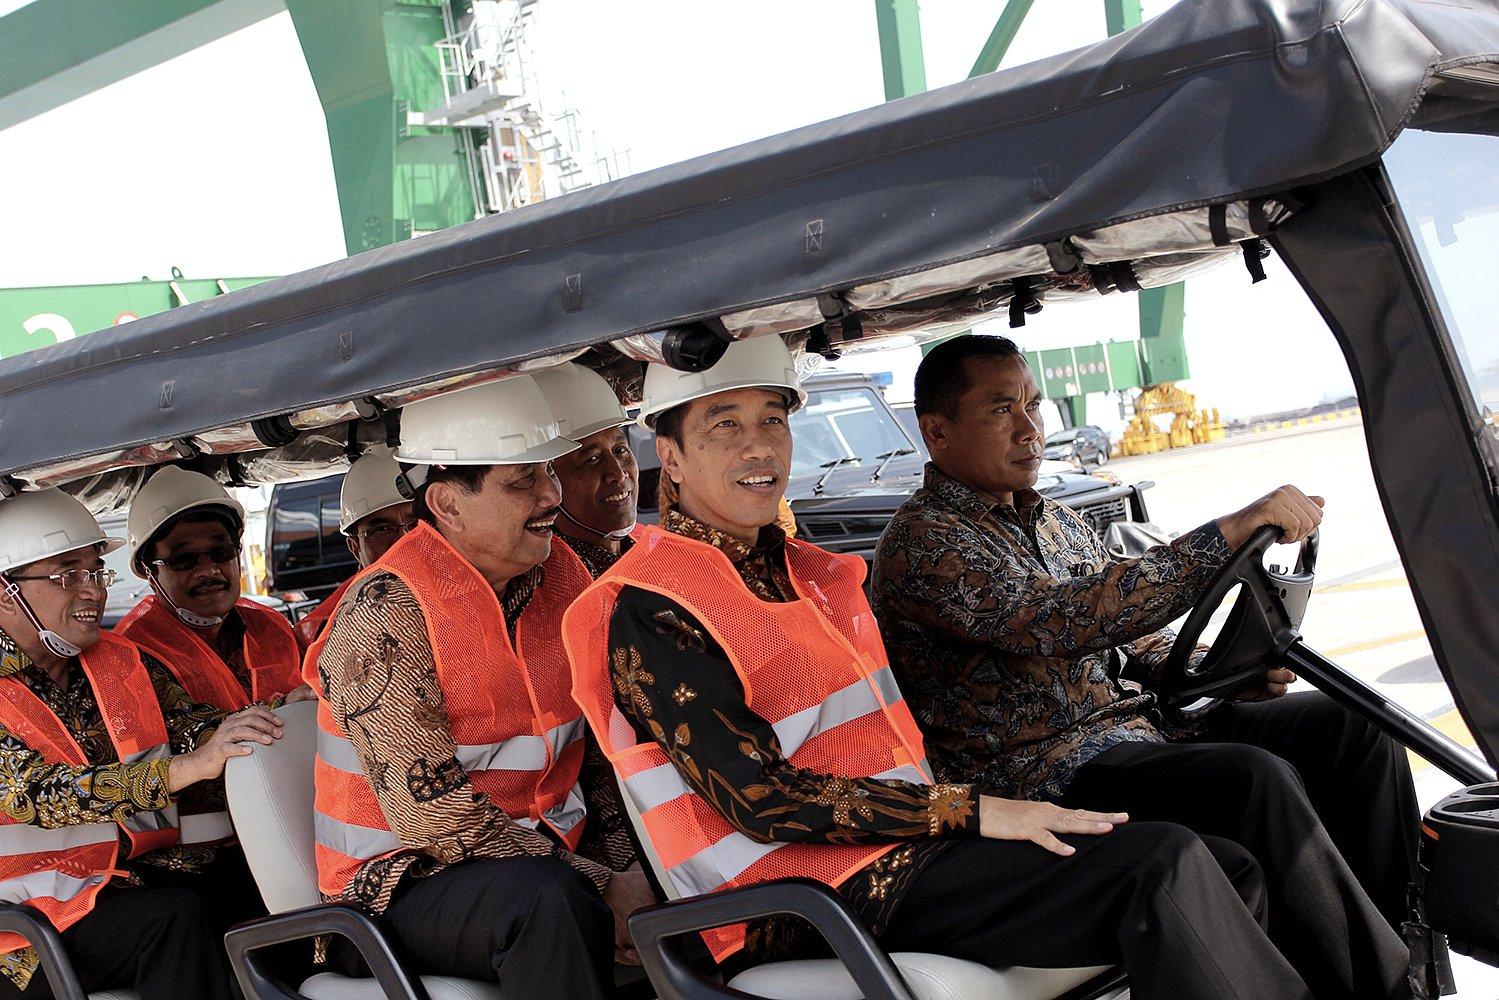 Presiden Joko Widodo meninjau New Priok Container Terminal (NPCT) 1, Pelabuhan Tanjung Priok, Jakarta, Selasa (13/9). Terminal diproyeksikan dapat melayani kapal petikemas berkapasitas I3 ribu hingga 15 ribu TEUs dengan bobot di atas 150 ribu DWT.